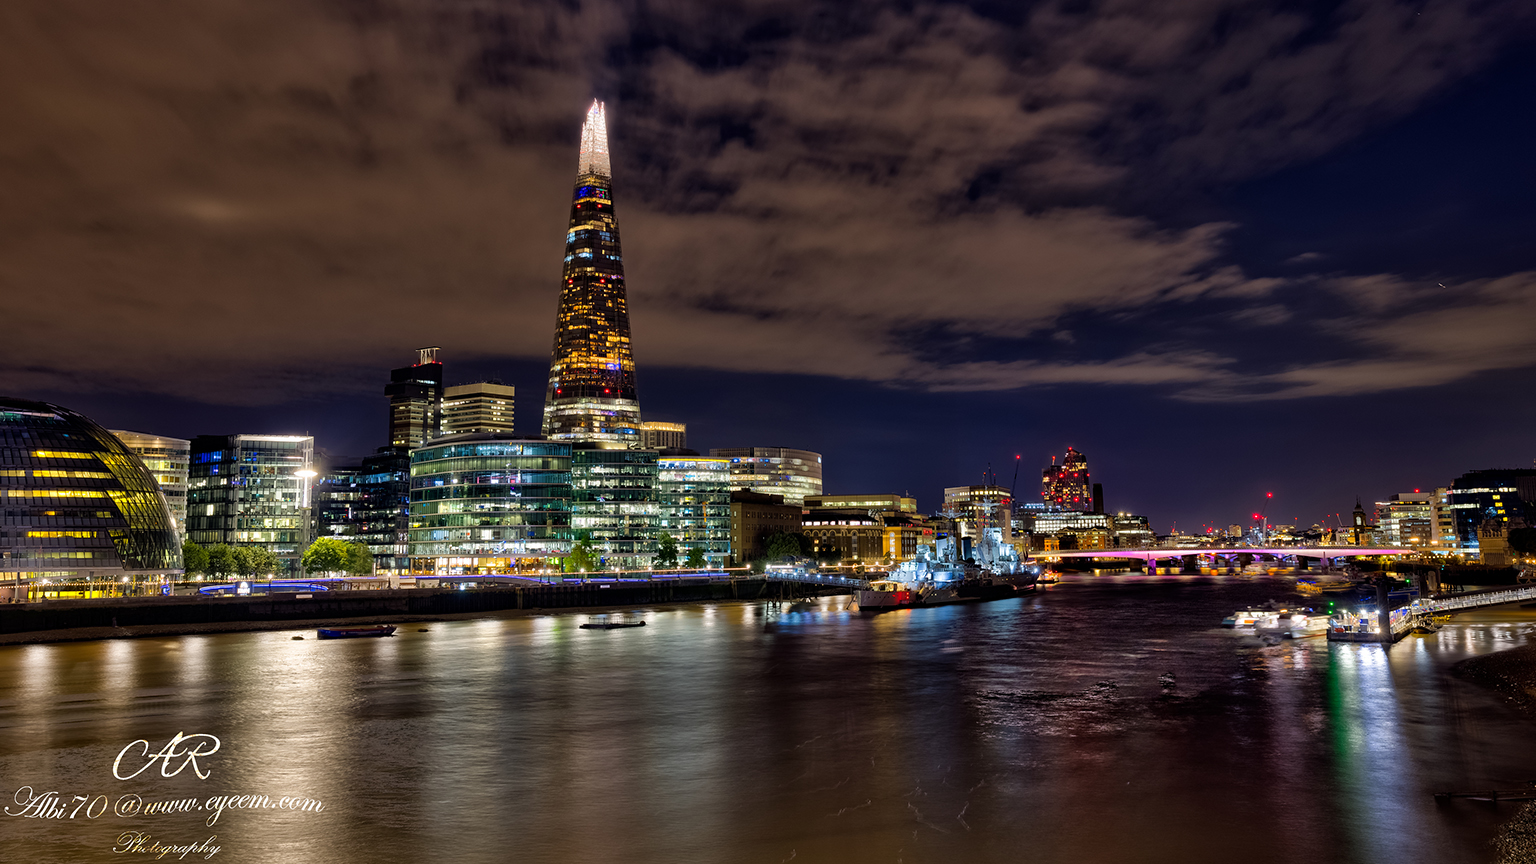 The Shard from Tower Bridge, United Kingdom